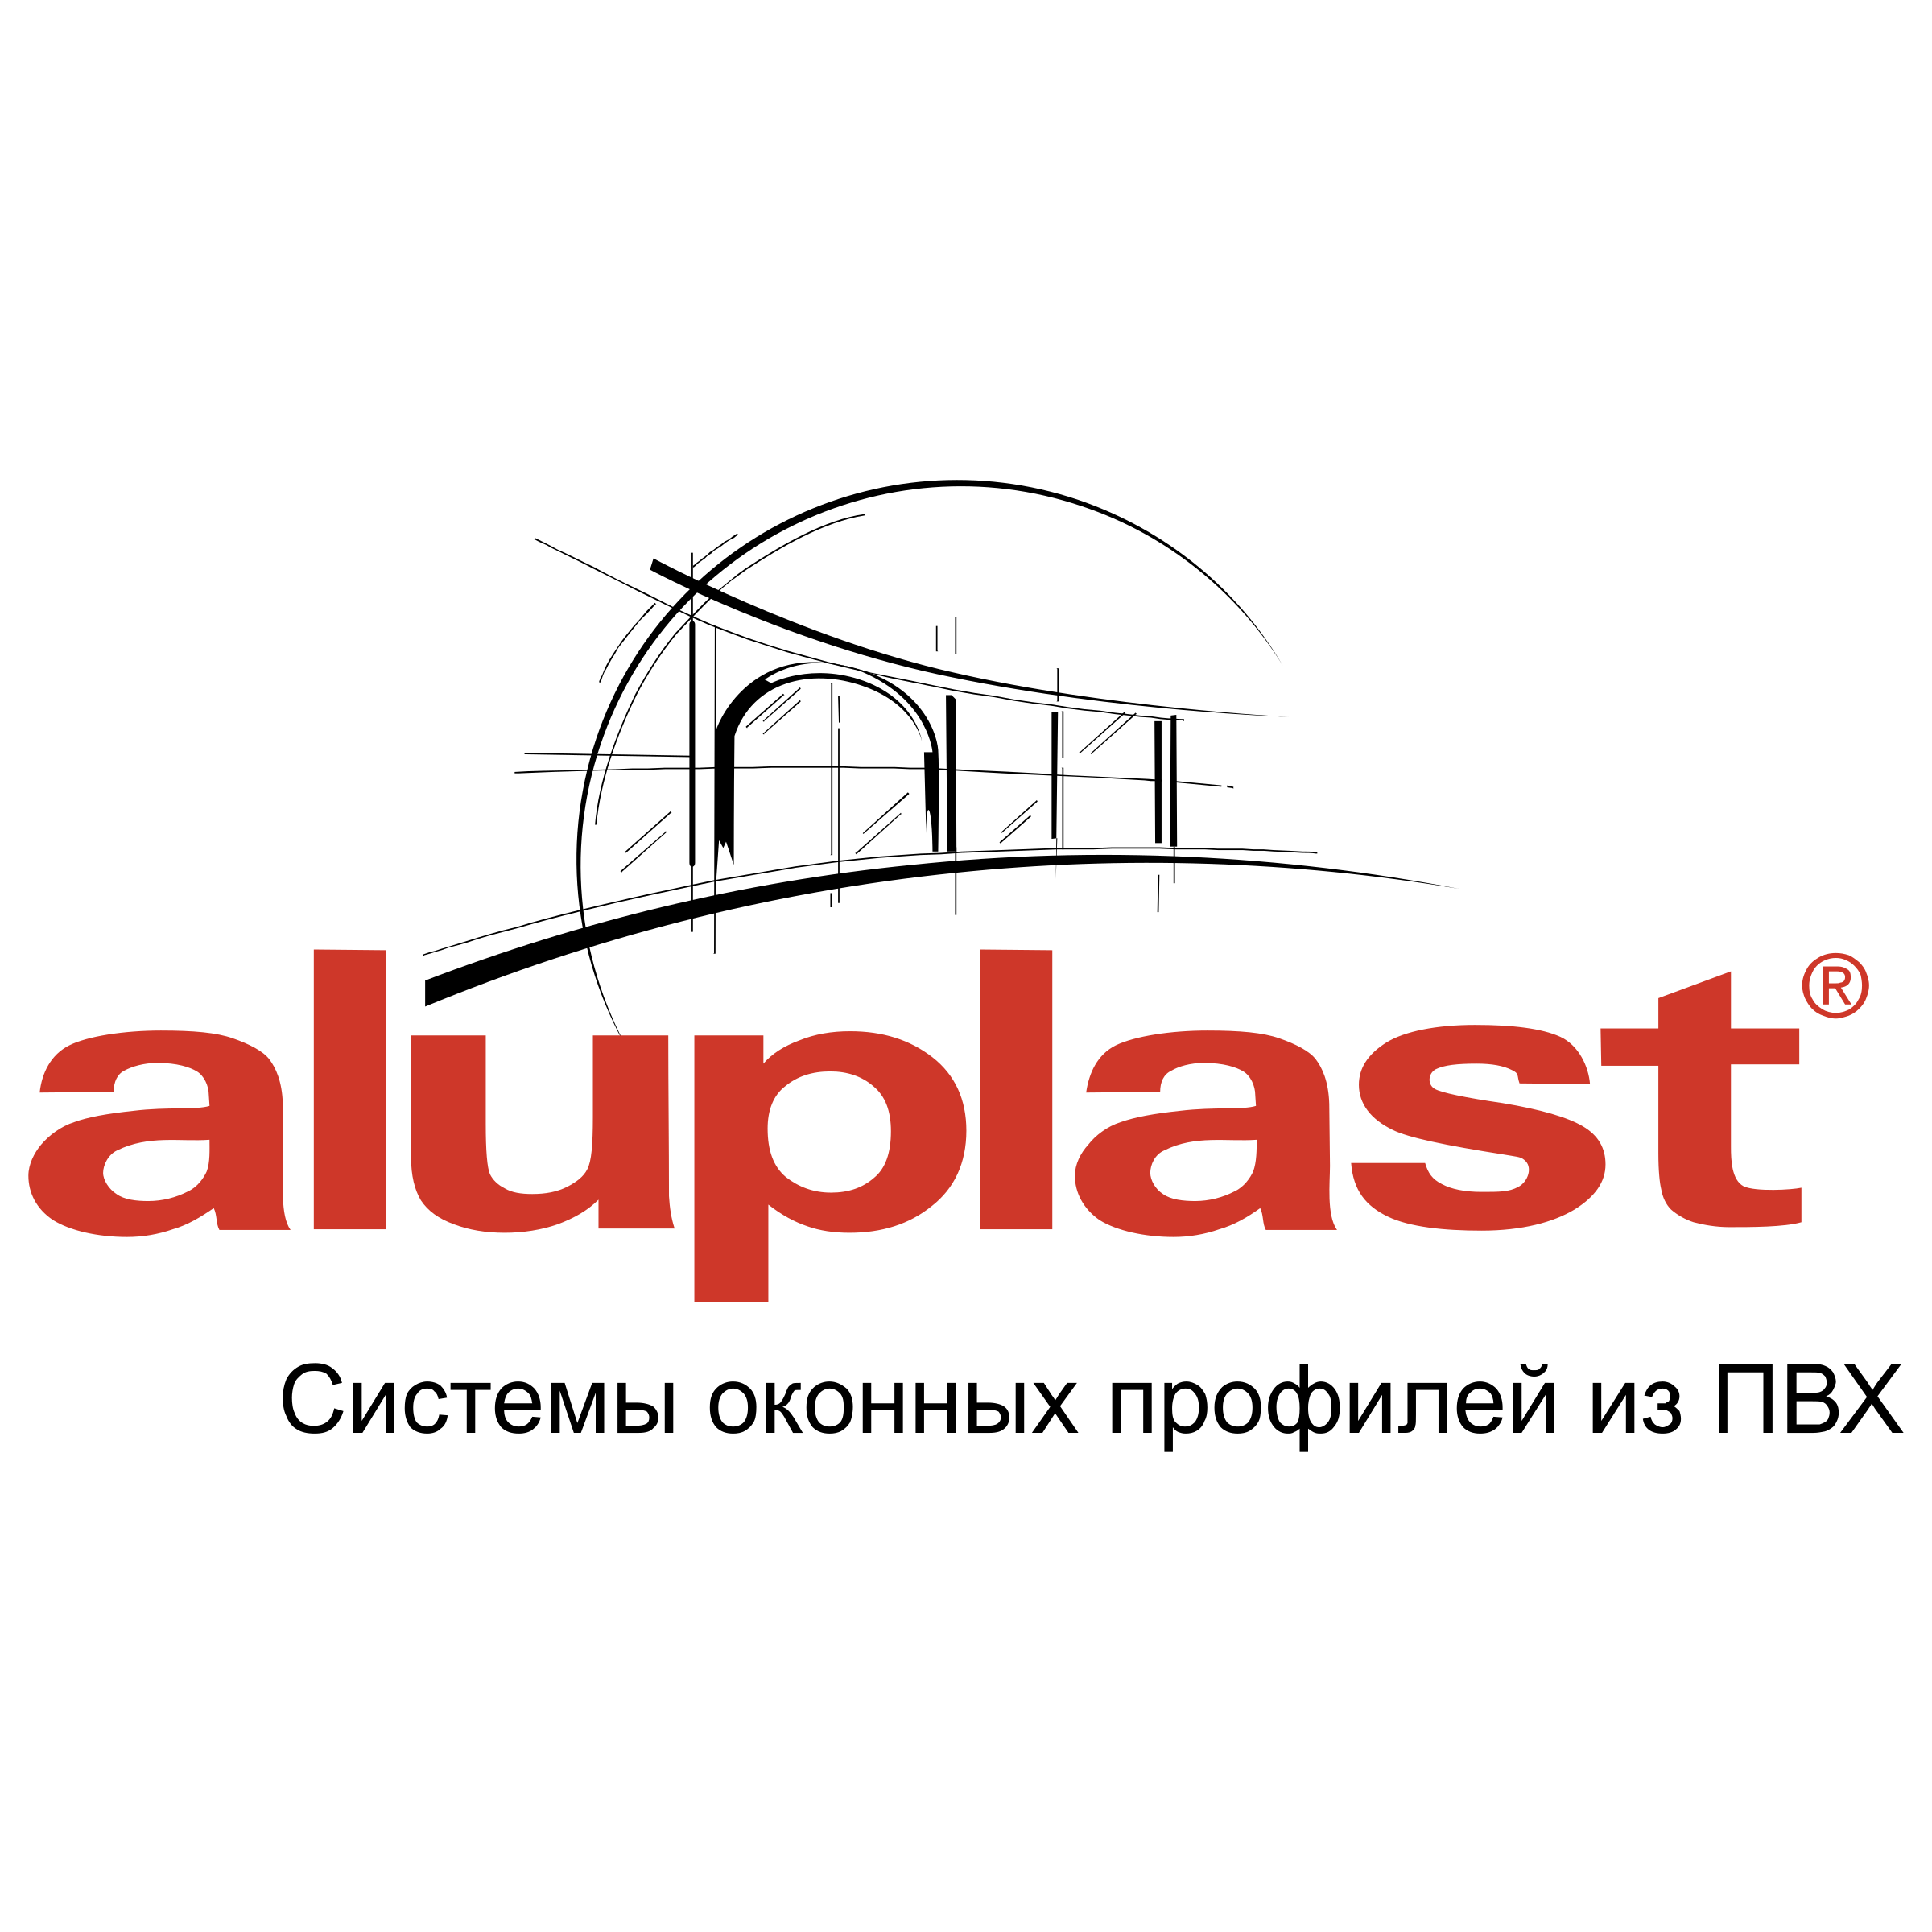 aluplast logo png transparent